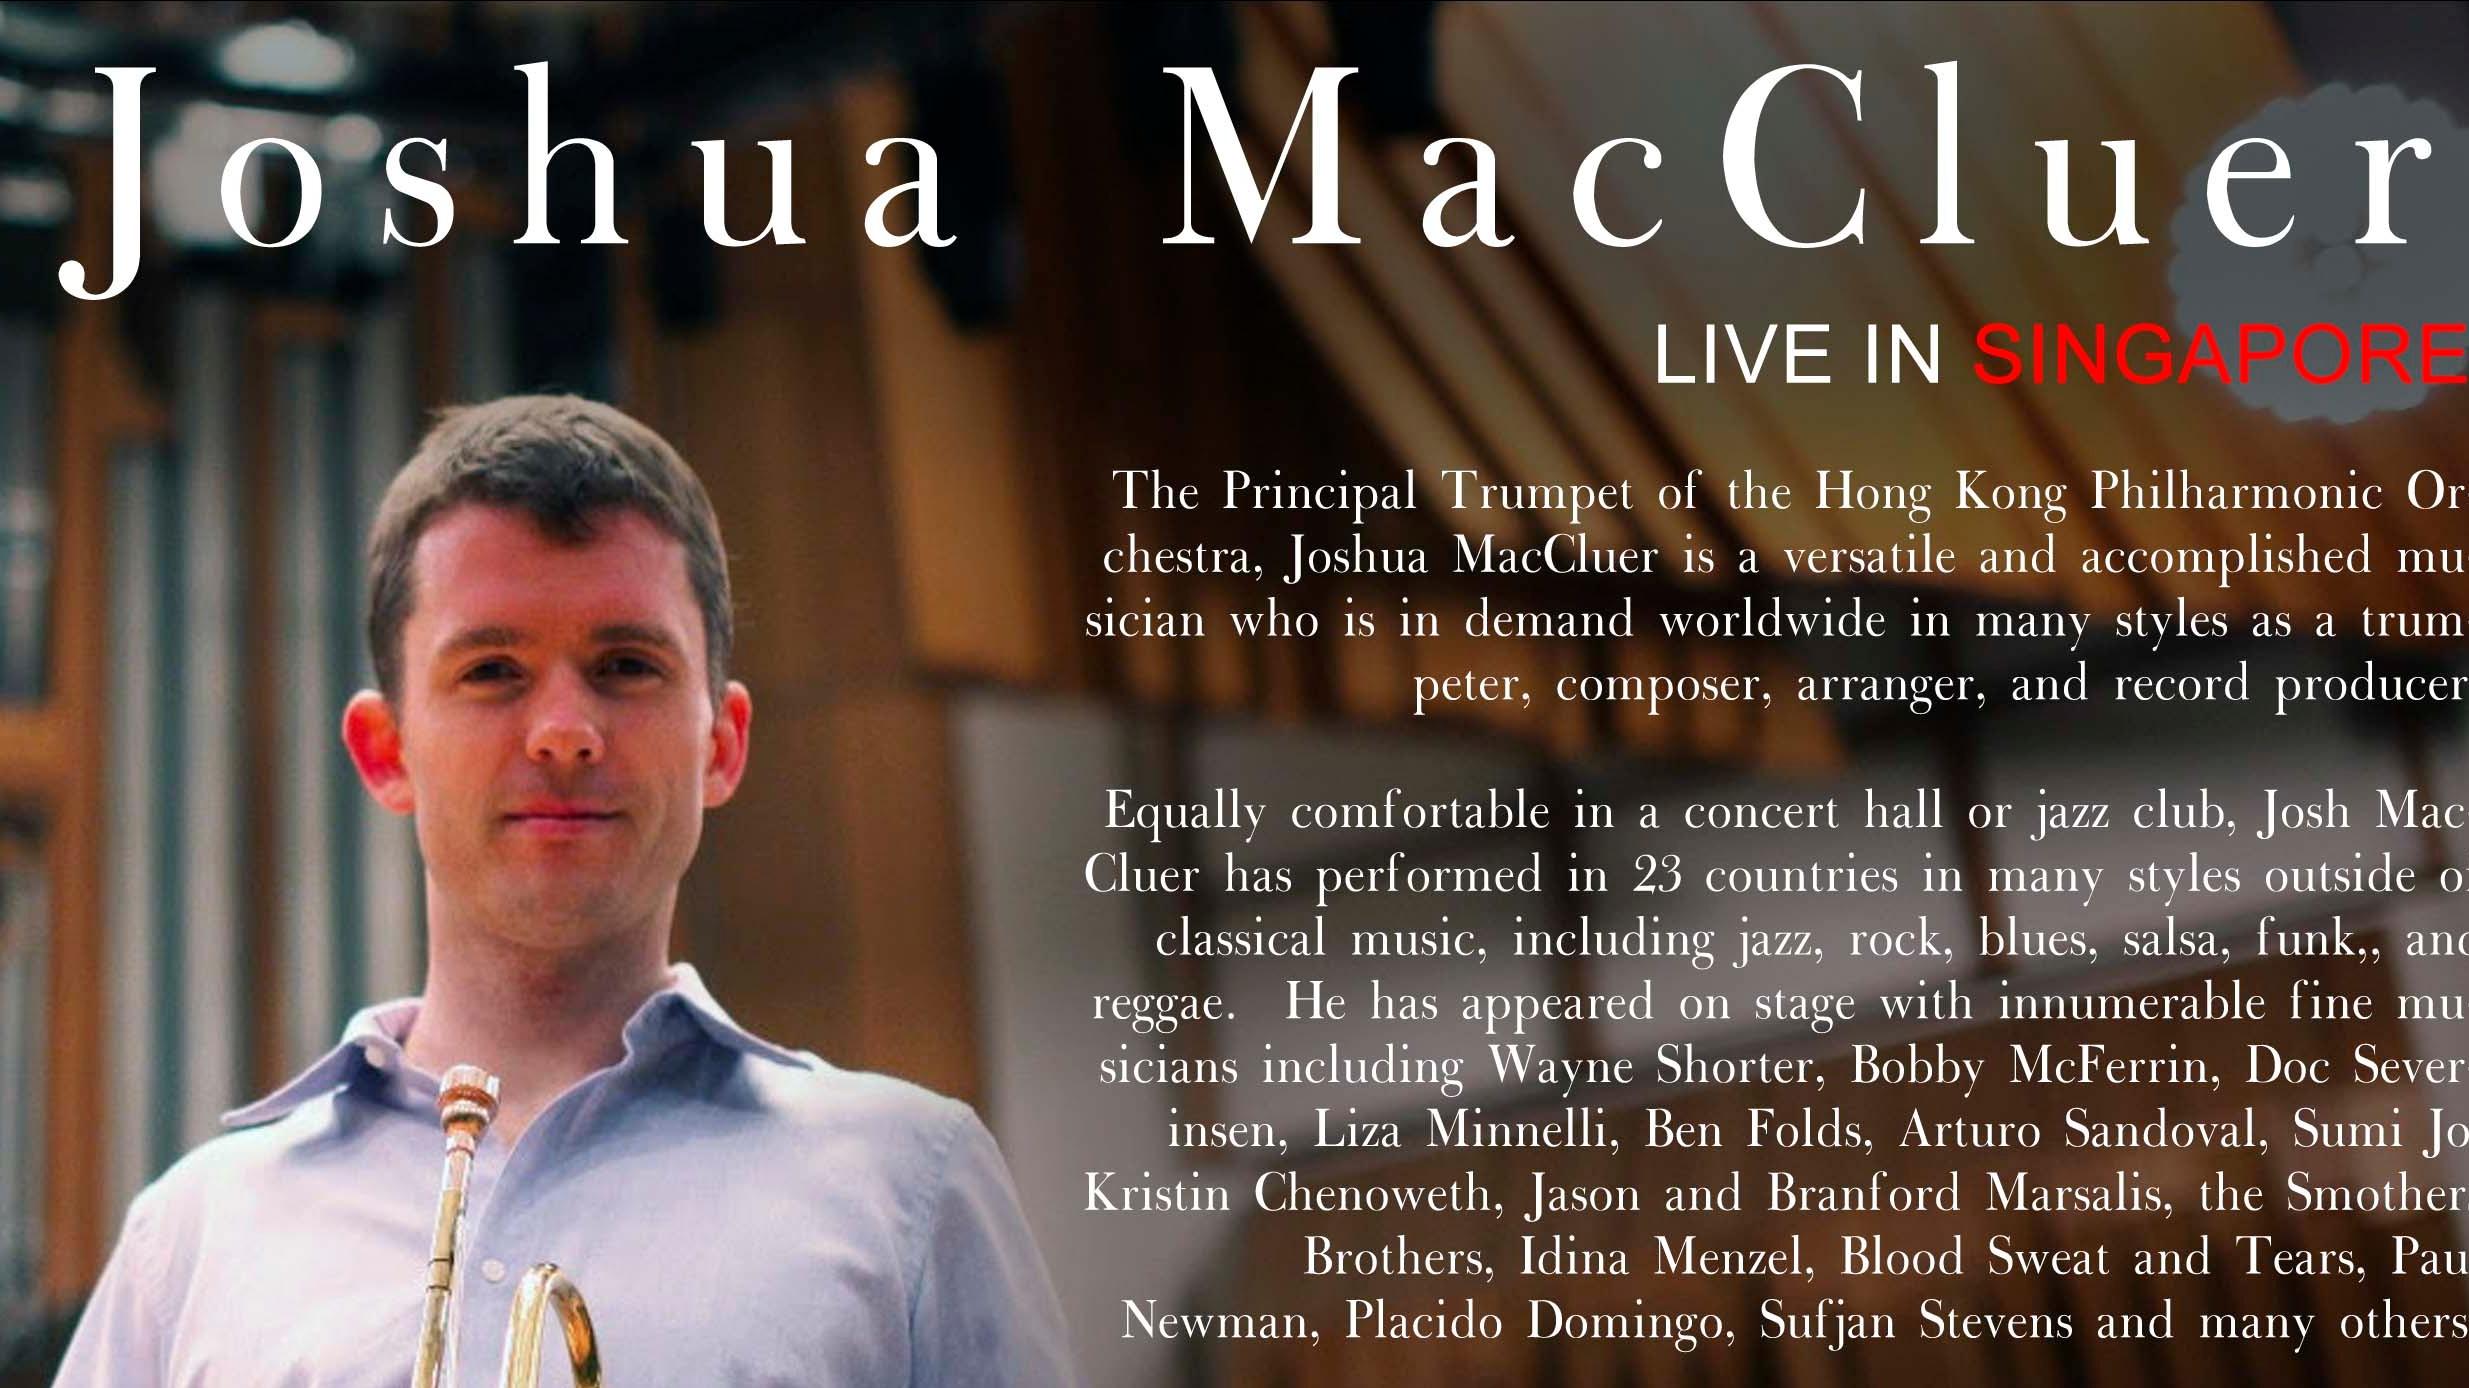 Josh Macluer LIVE IN SINGAPORE